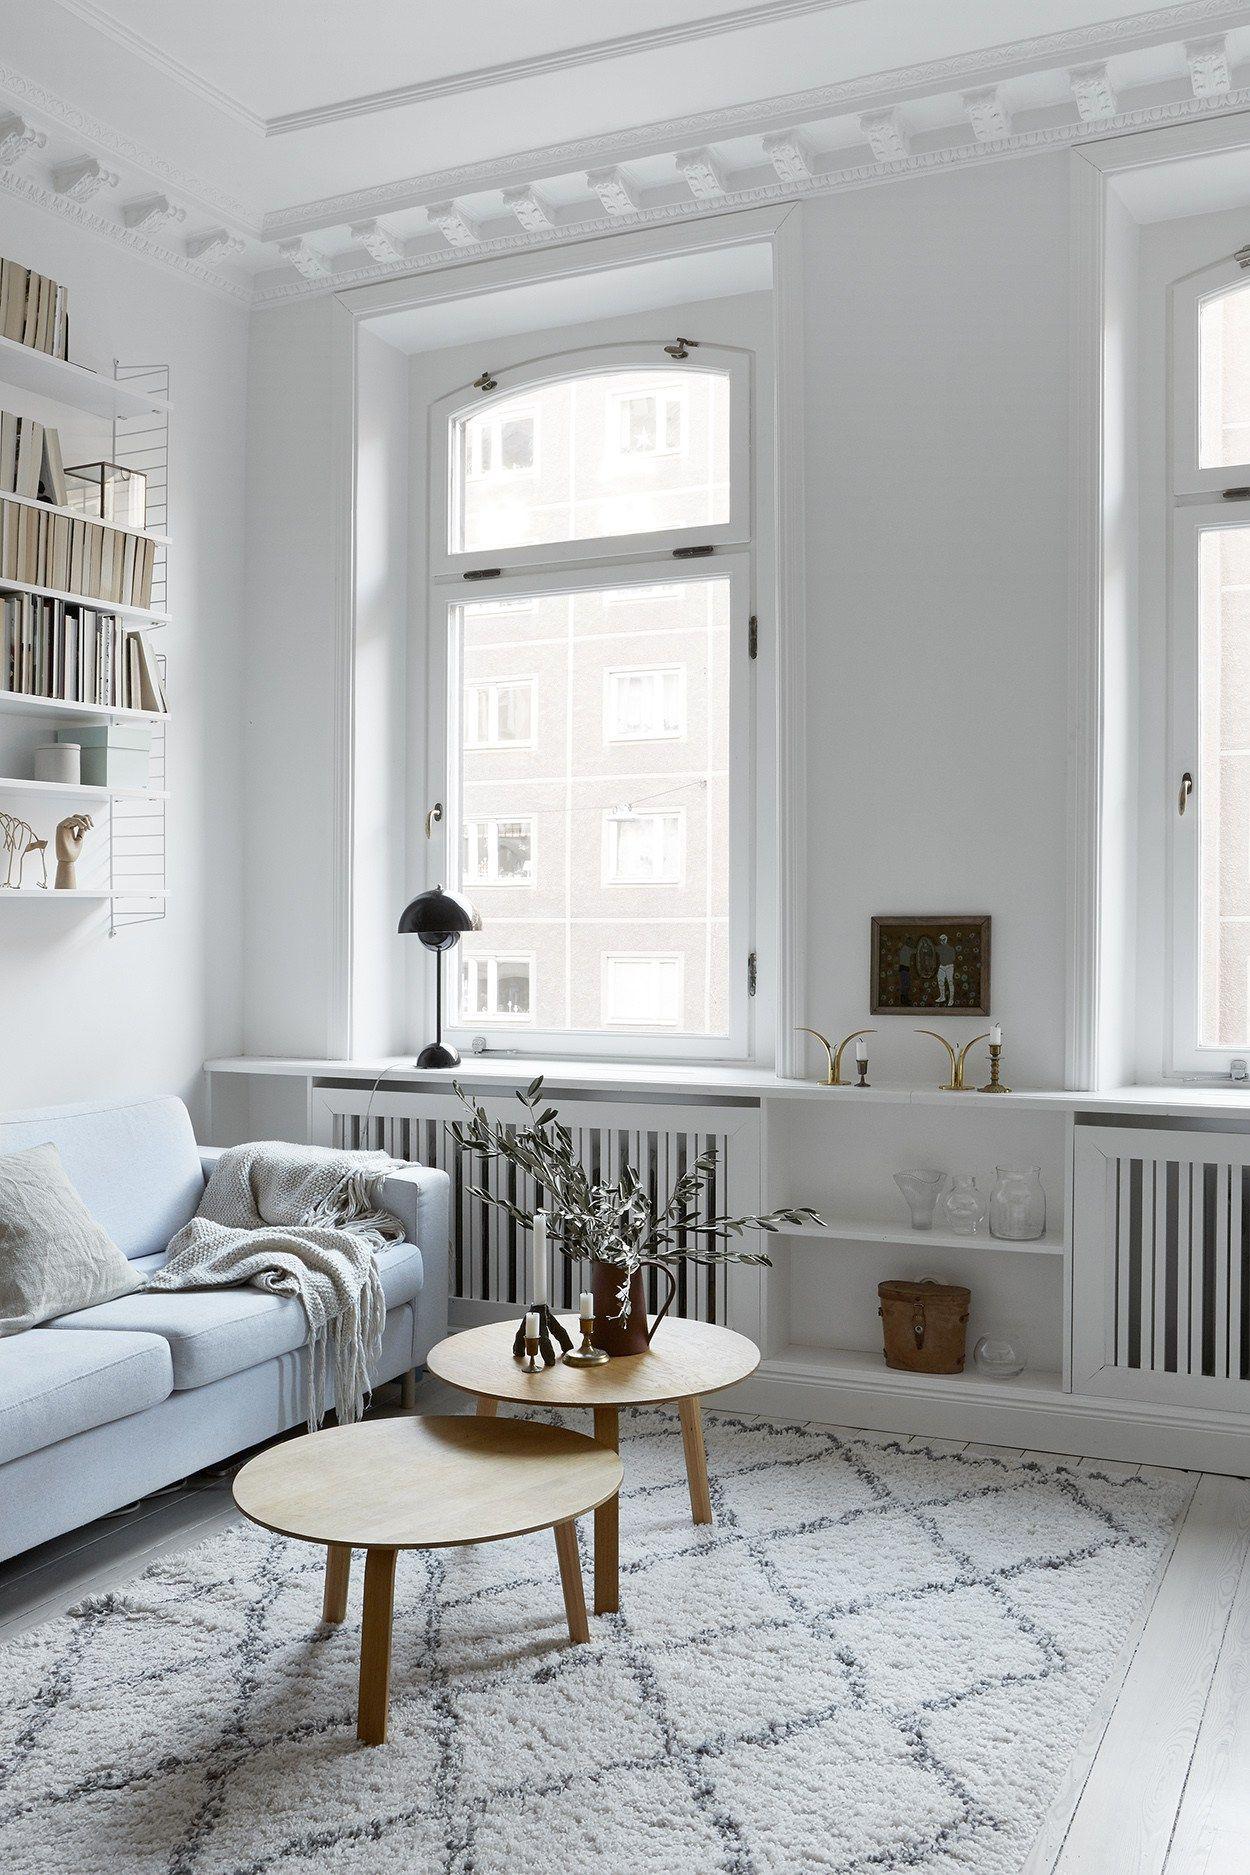 Renovar acabados en pisos antiguos decoracion pisos for Salones para pisos